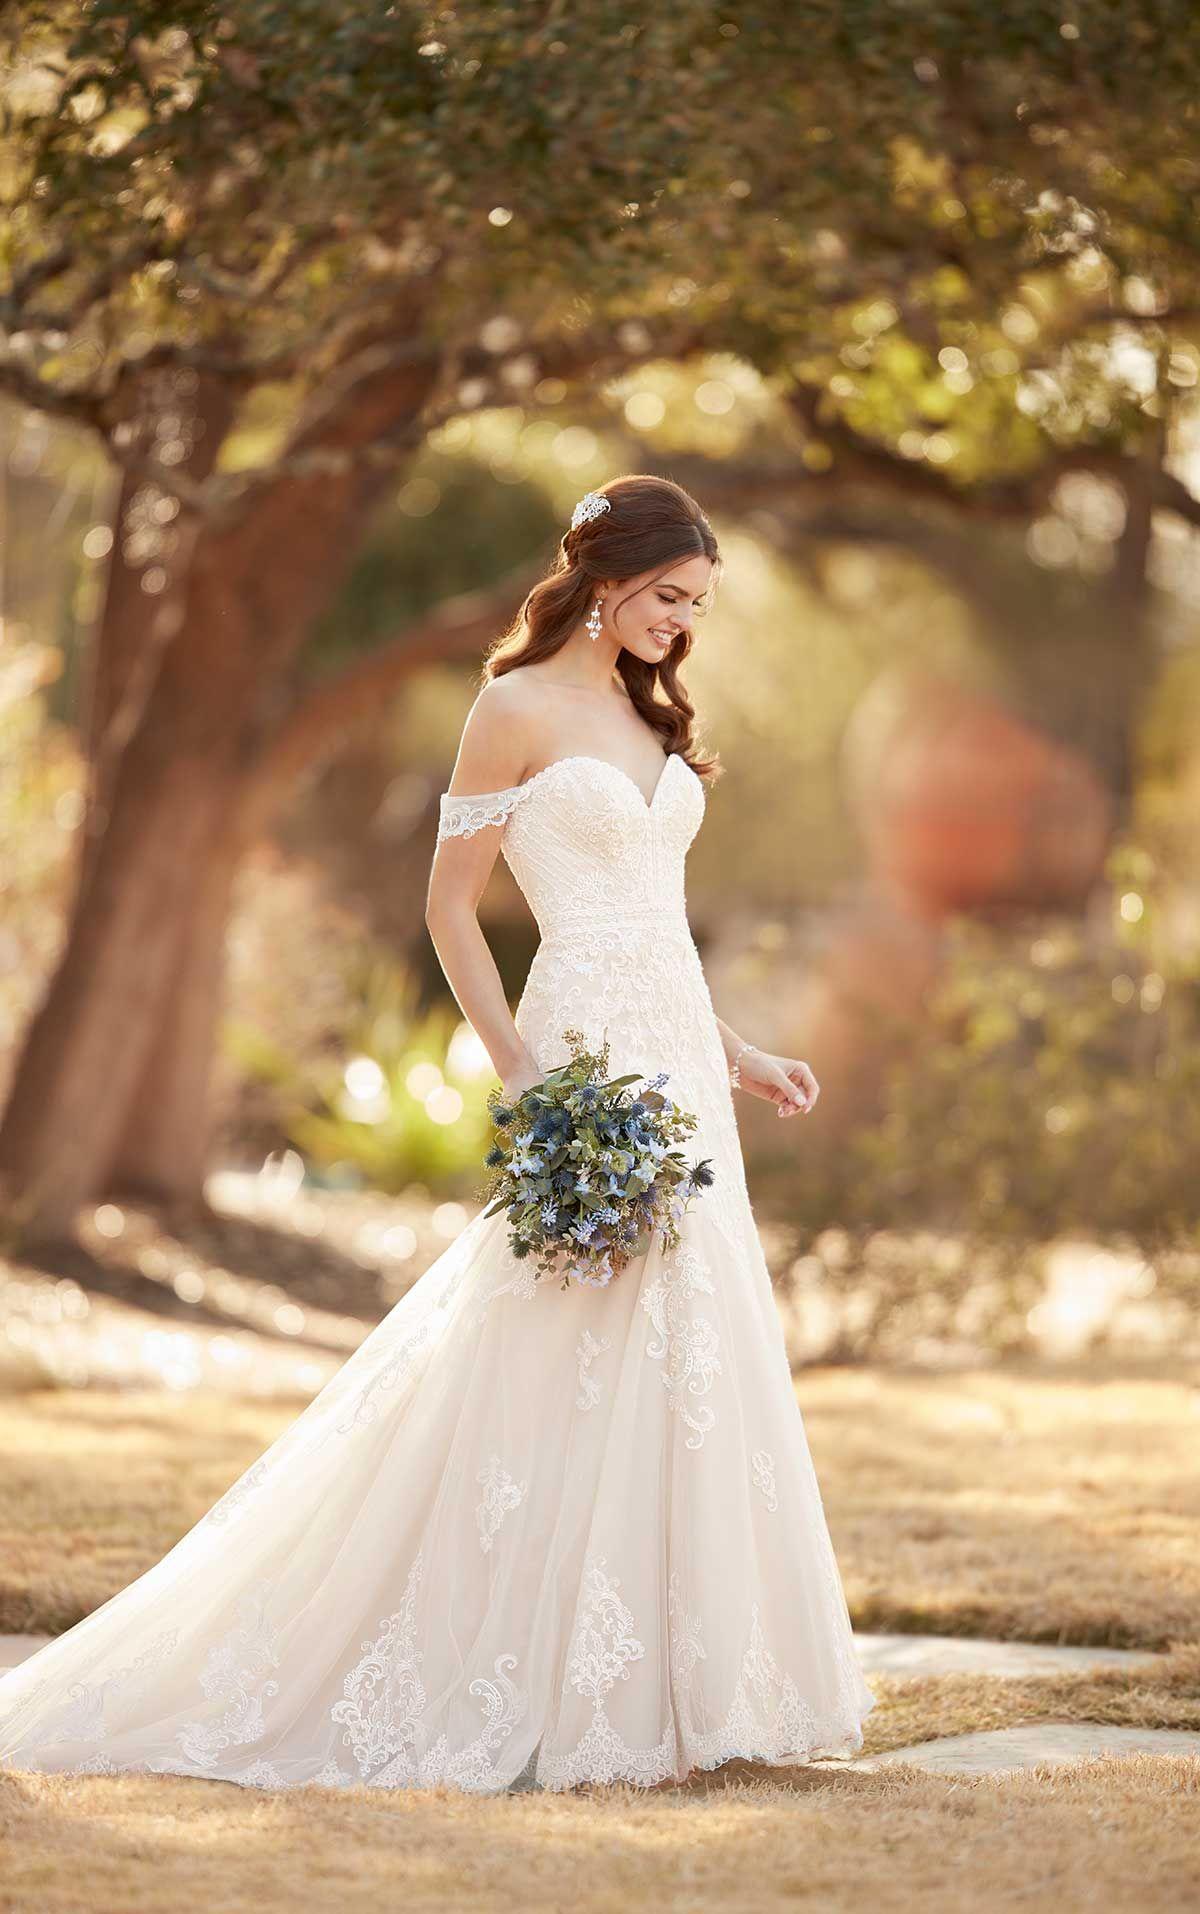 Mermaid Wedding Dress with Rich Beadwork Essense of